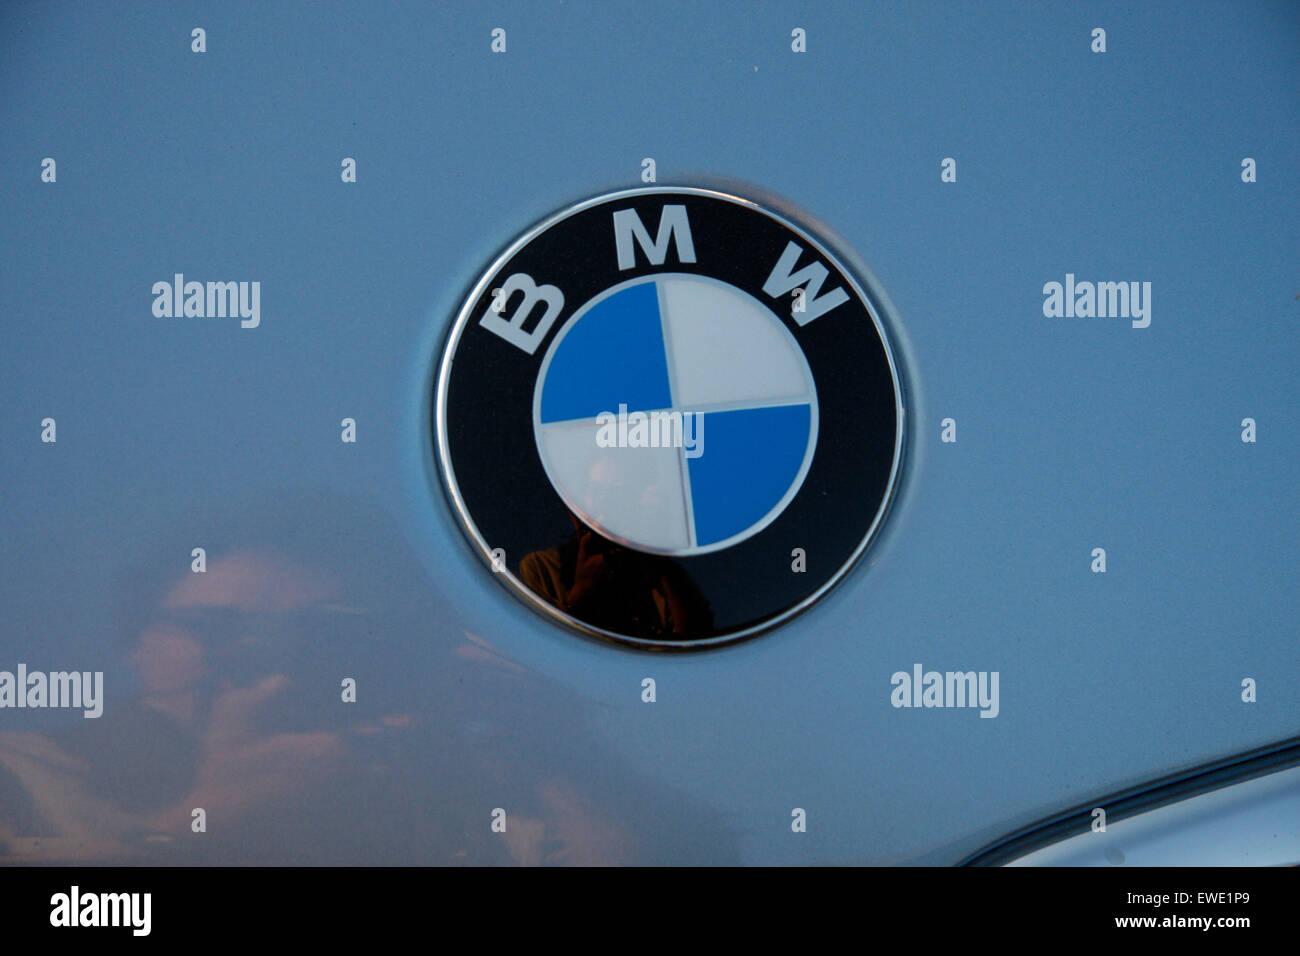 JUNE 2008 - BERLIN: the logo embleme of the German car manufacturer BMW - Bayerische Motorenwerke. - Stock Image